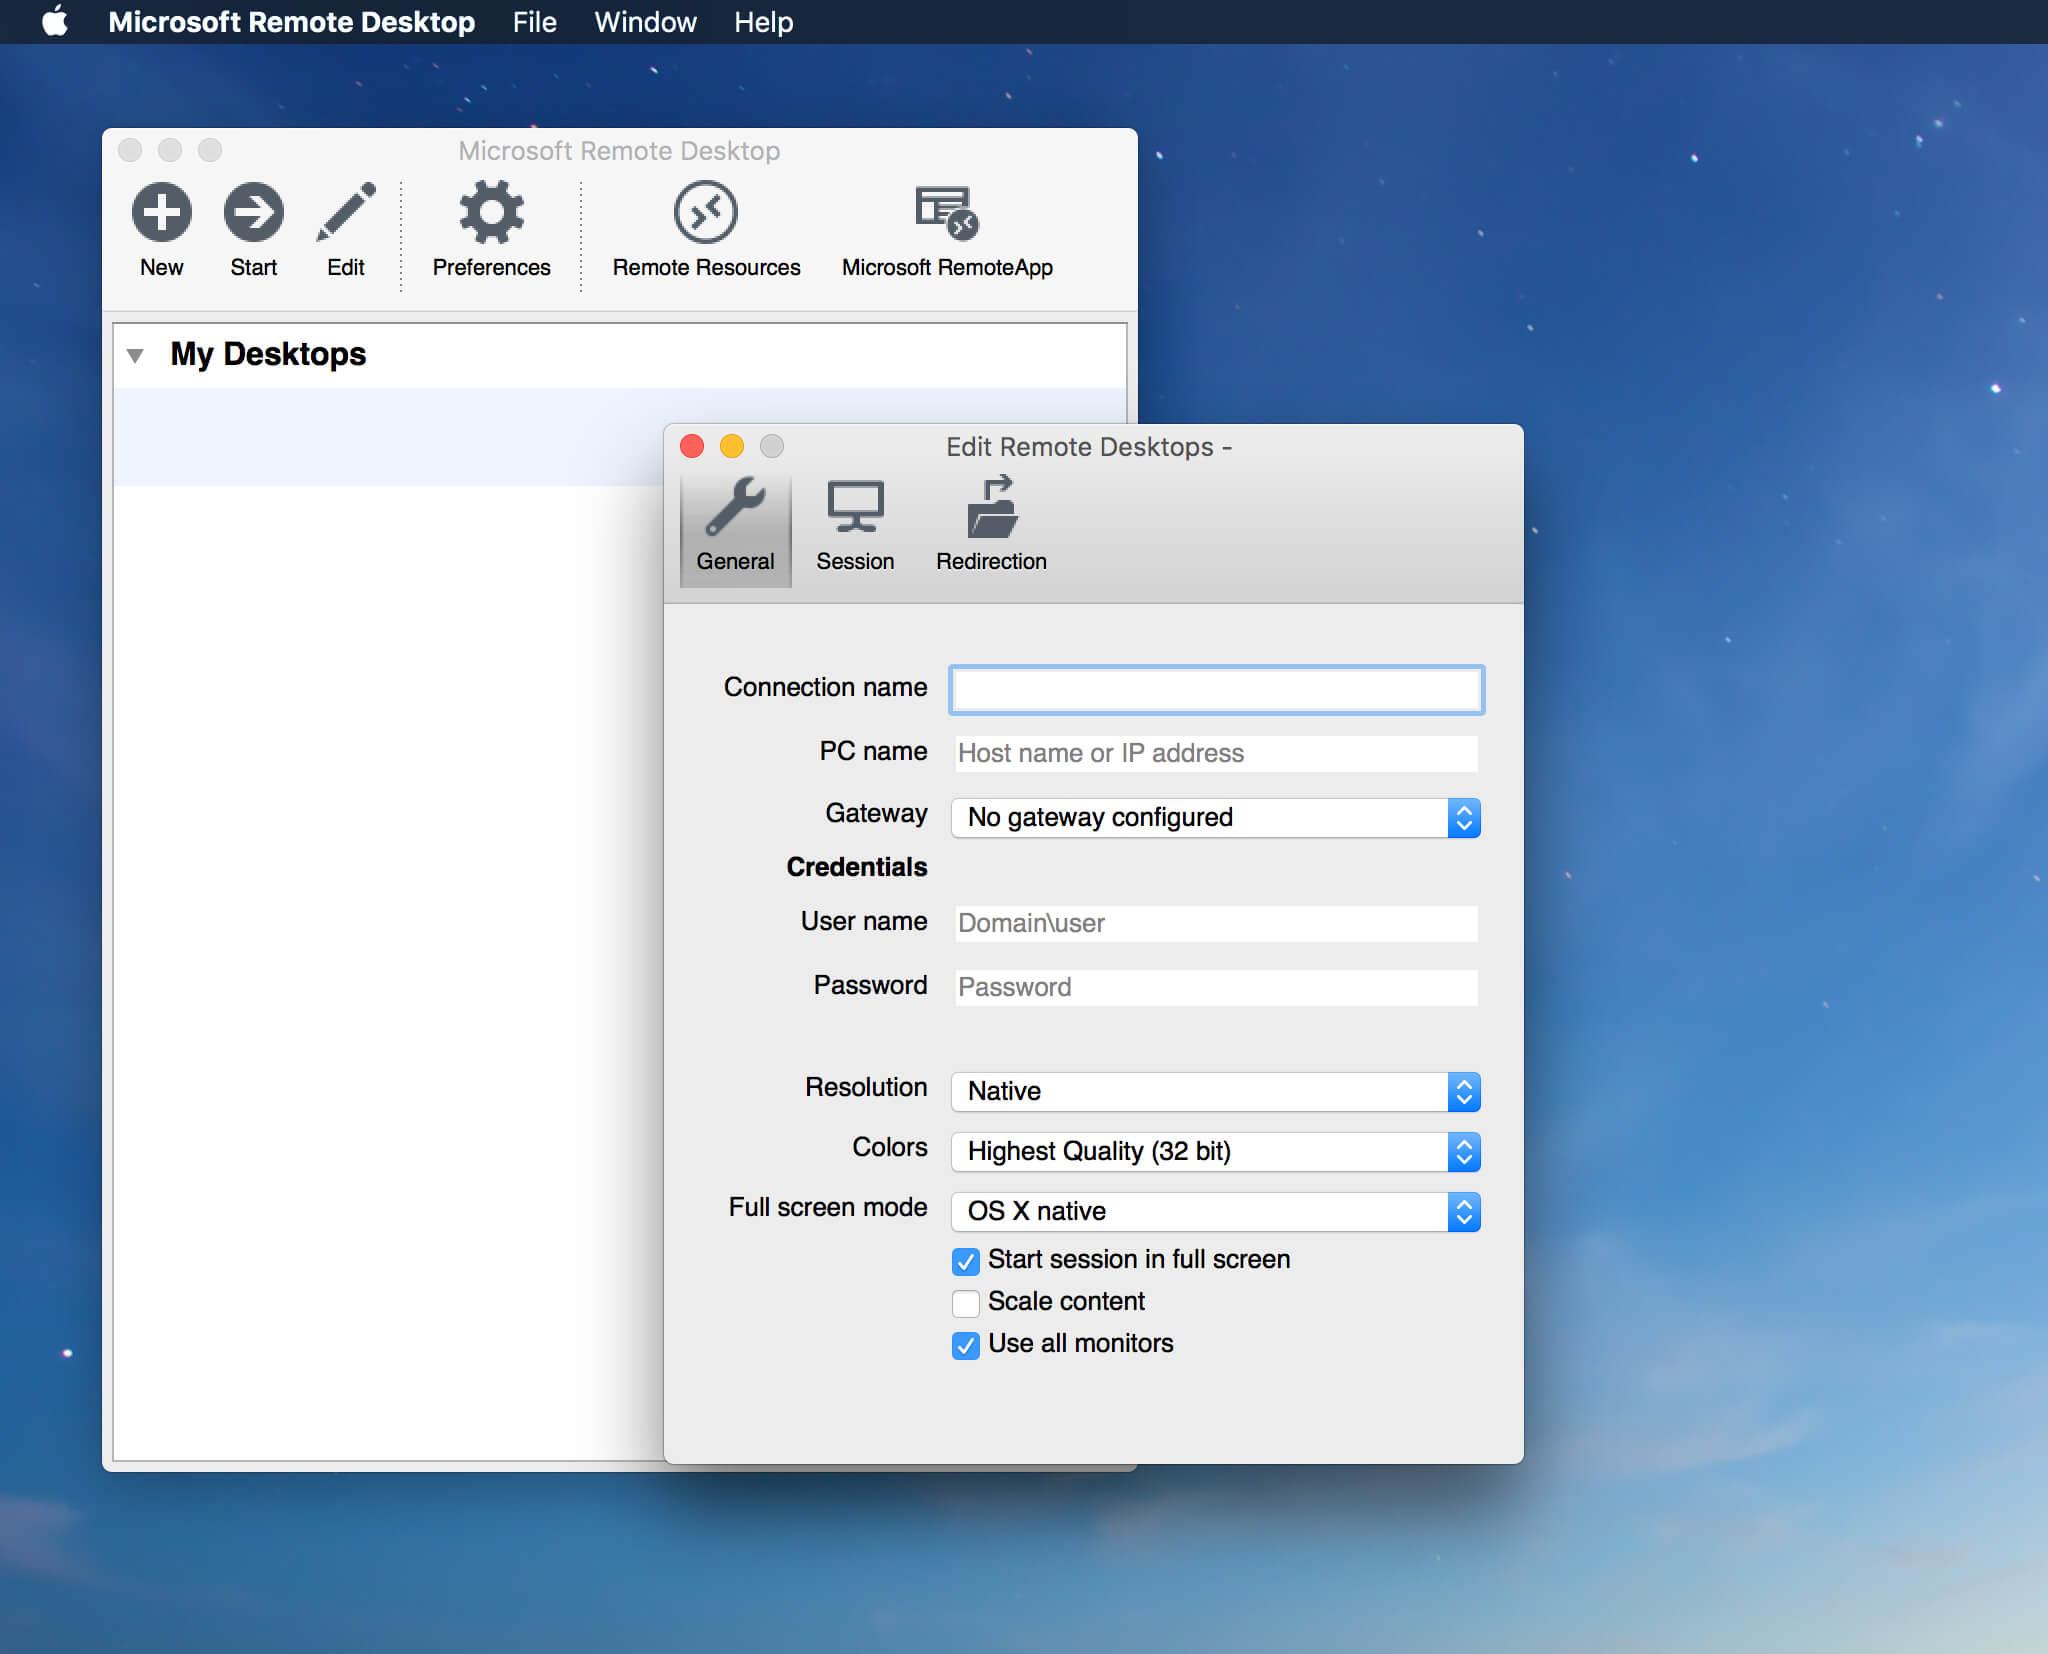 Microsoft Remote Desktop 8.0.7远程桌面控制